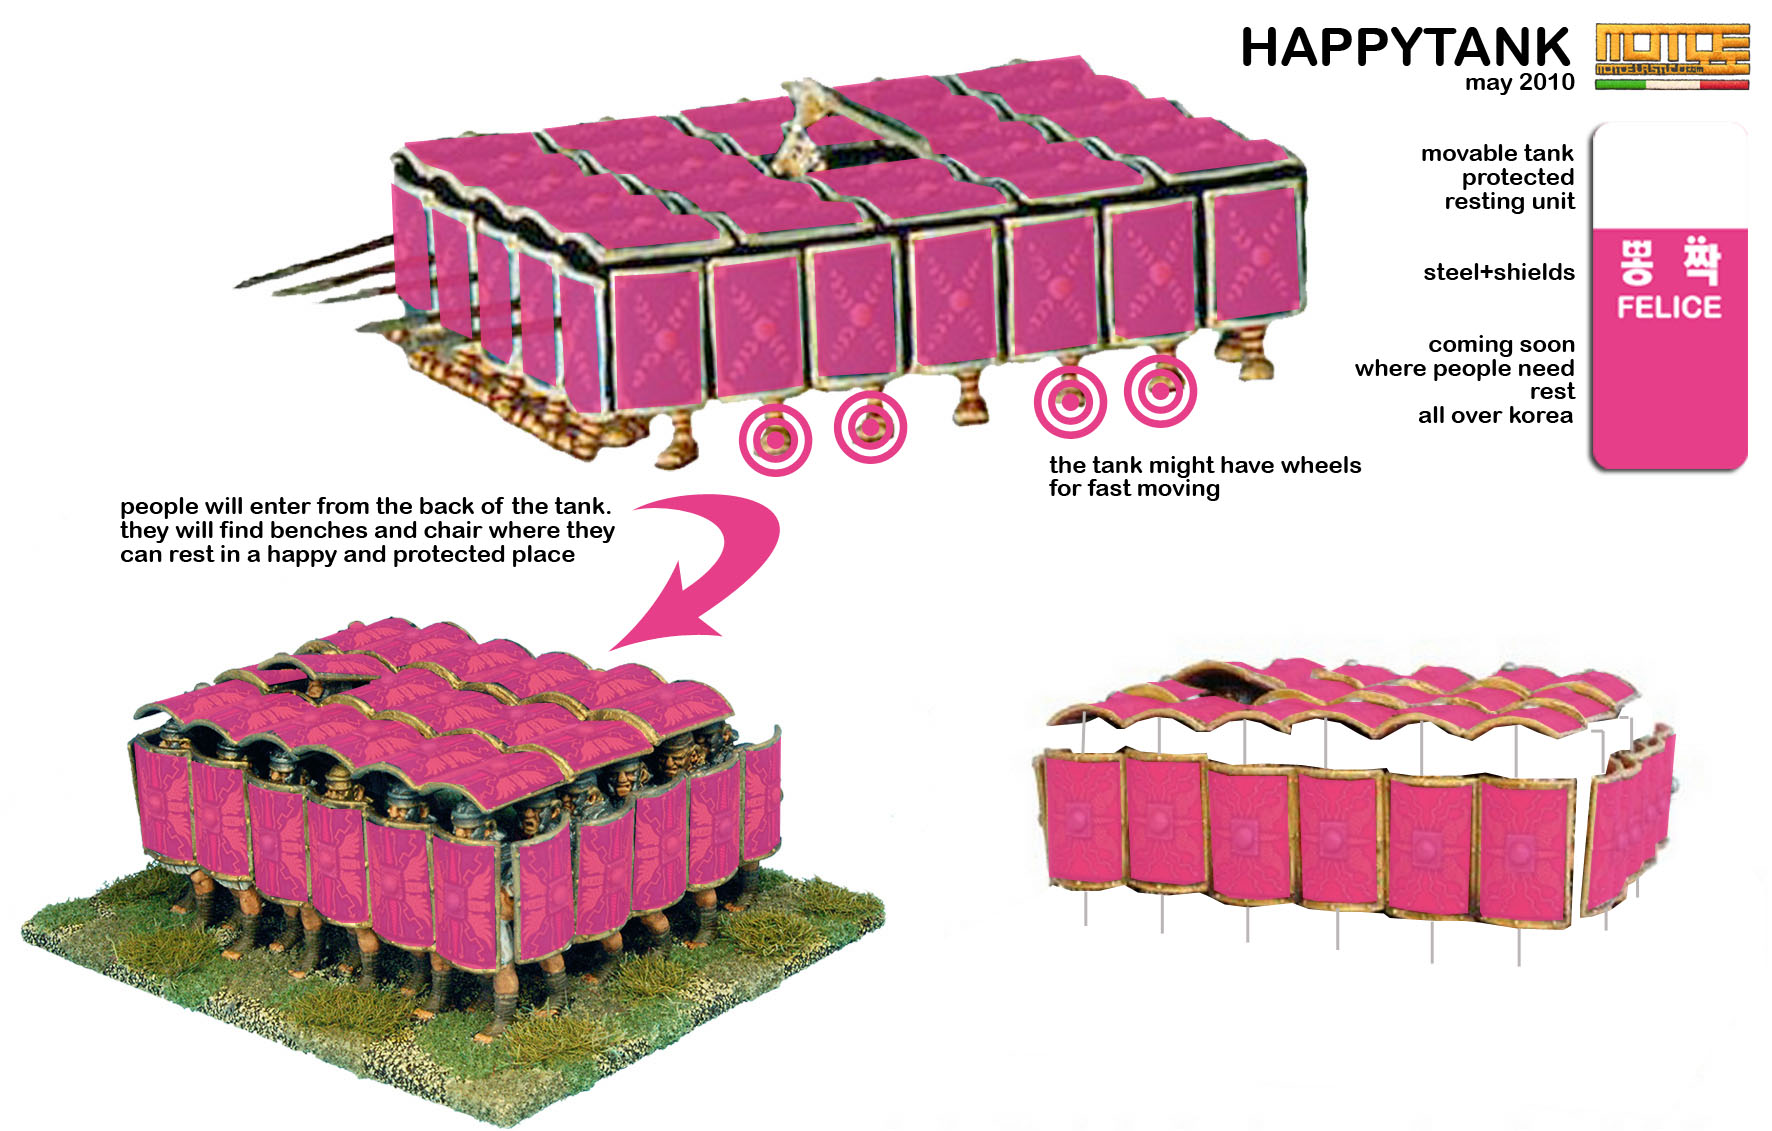 happytank.jpg